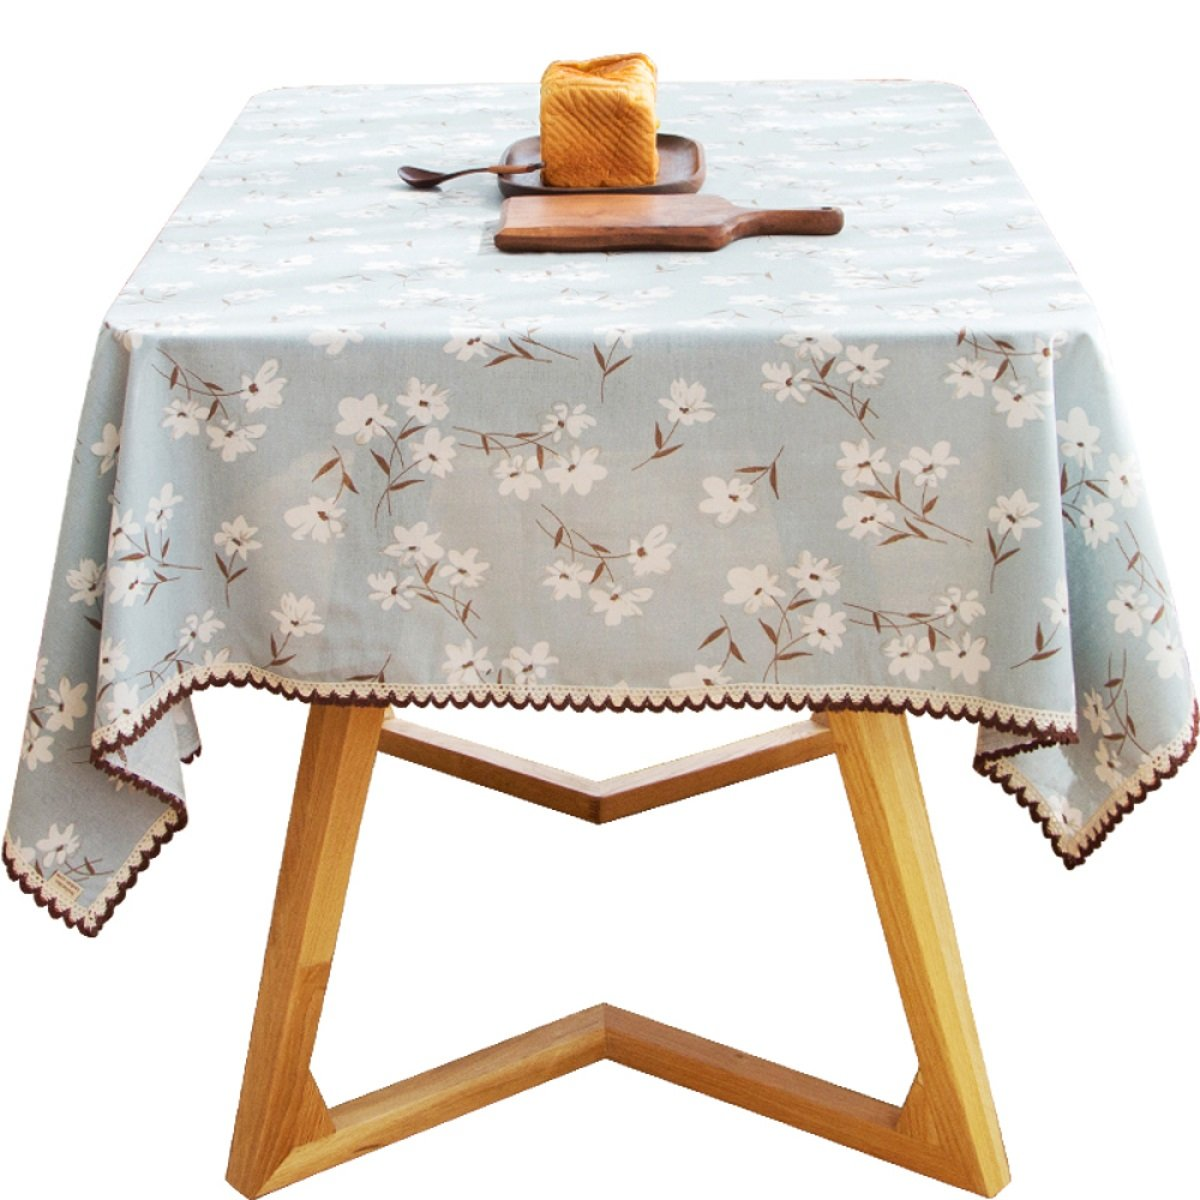 Web oficial DONG Mantel Paños de cocina cocina cocina Paño de tabla Paño de tela Paño de tabla Paño de mesa de té Planta rectangular Flores Decoración del hogar Mantel casero Algodón (azul) (Tamaño   140220cm (55.186.6in)) 100140cm (39.455.1in)  respuestas rápidas